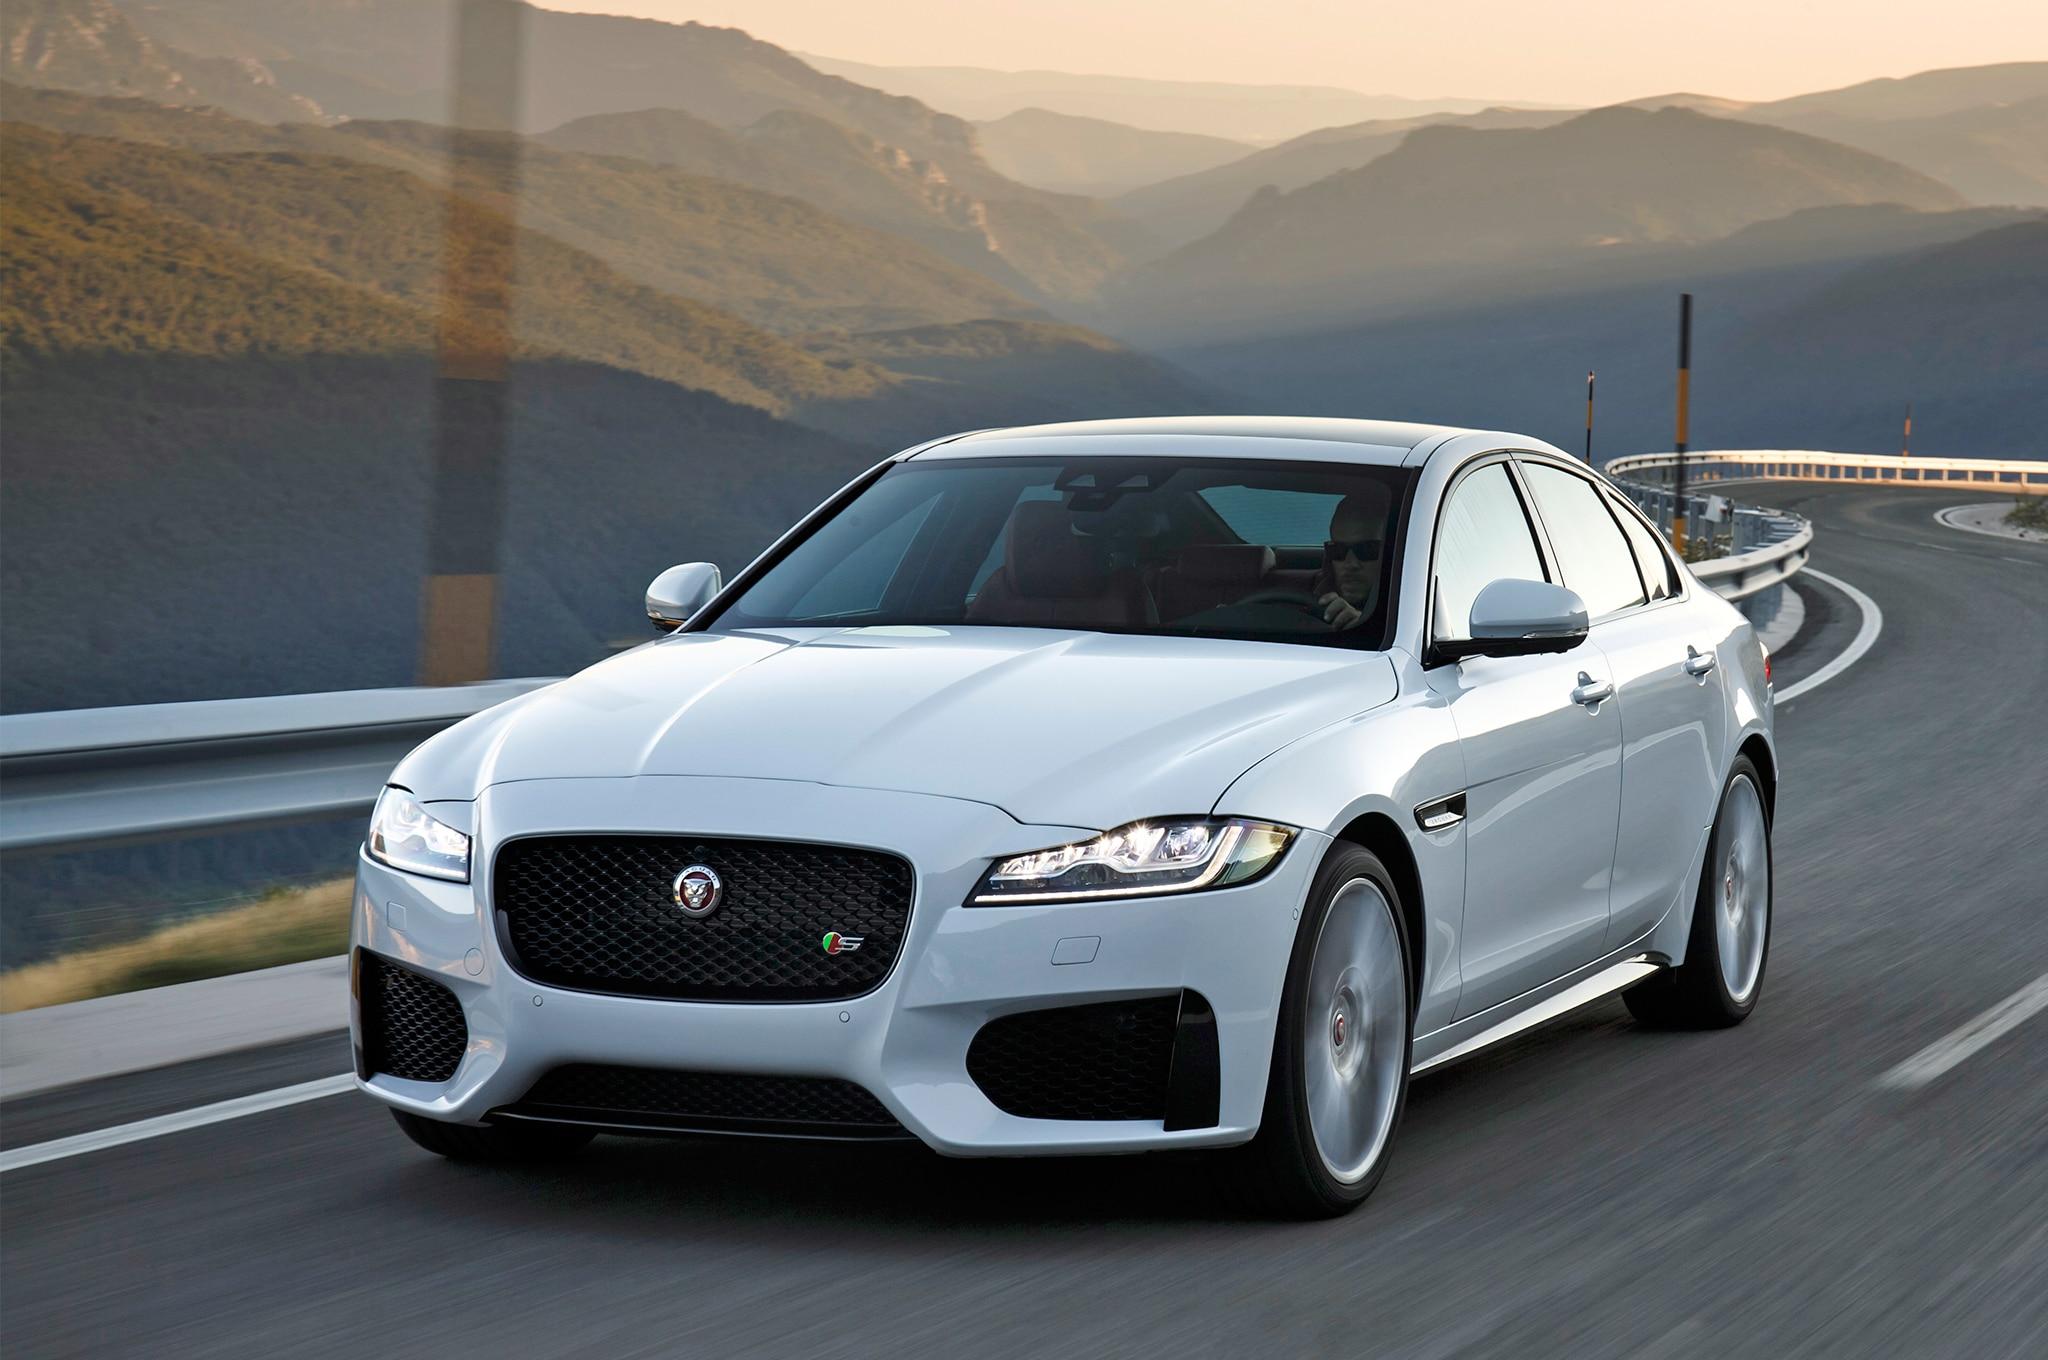 2019 Jaguar XF Adds Limited Edition 300 Sport Model | Automobile